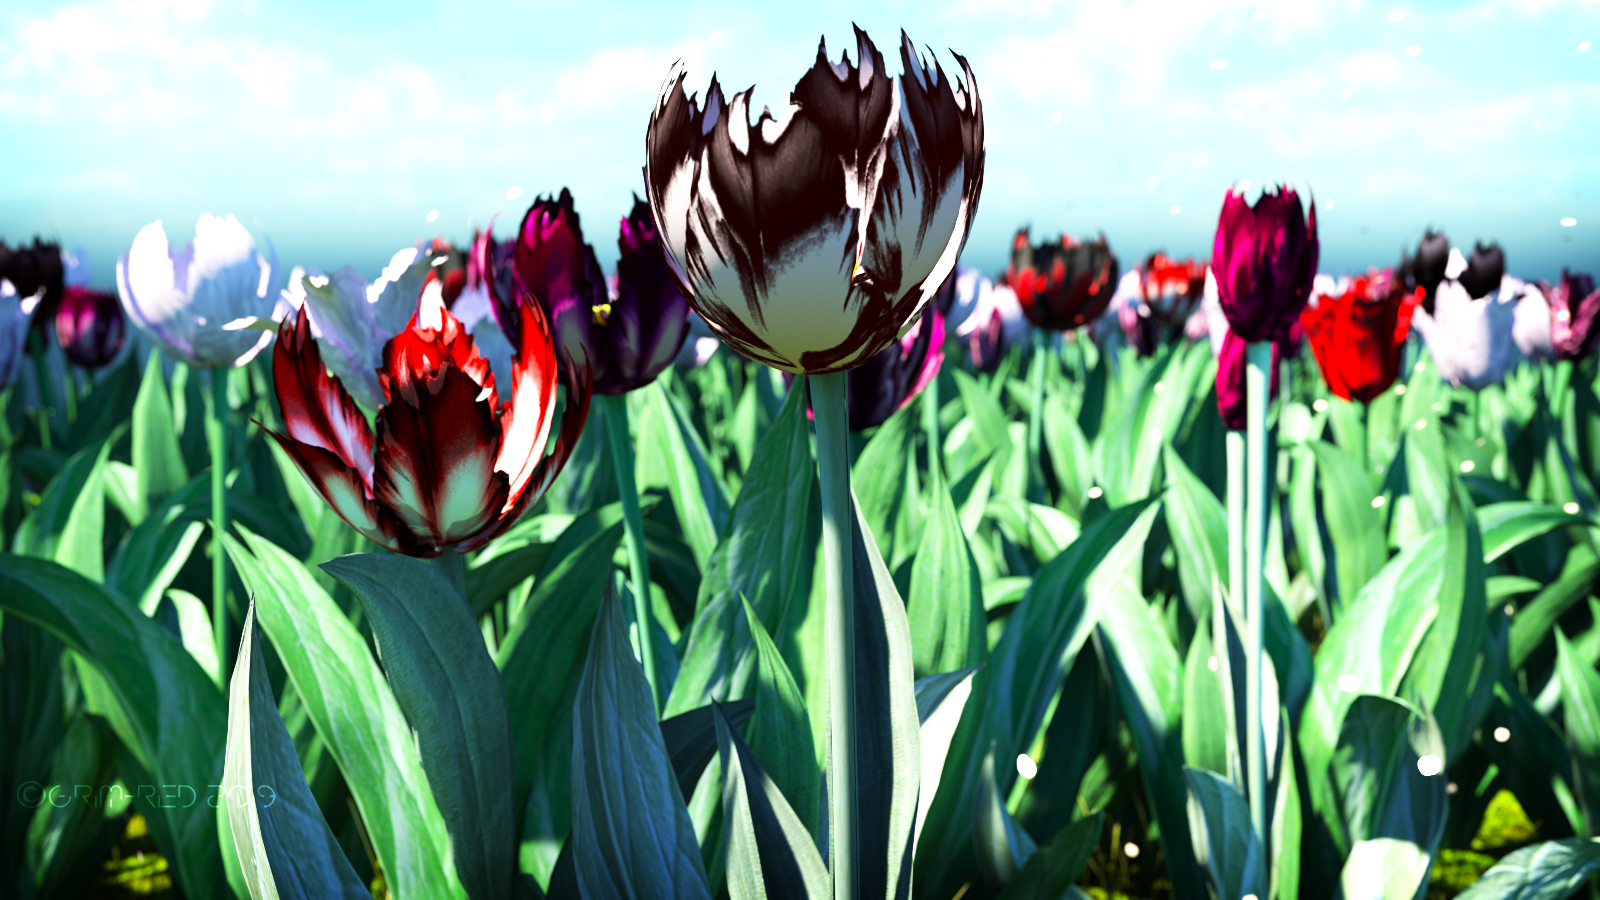 TulipPromoWideScreenMix.jpg